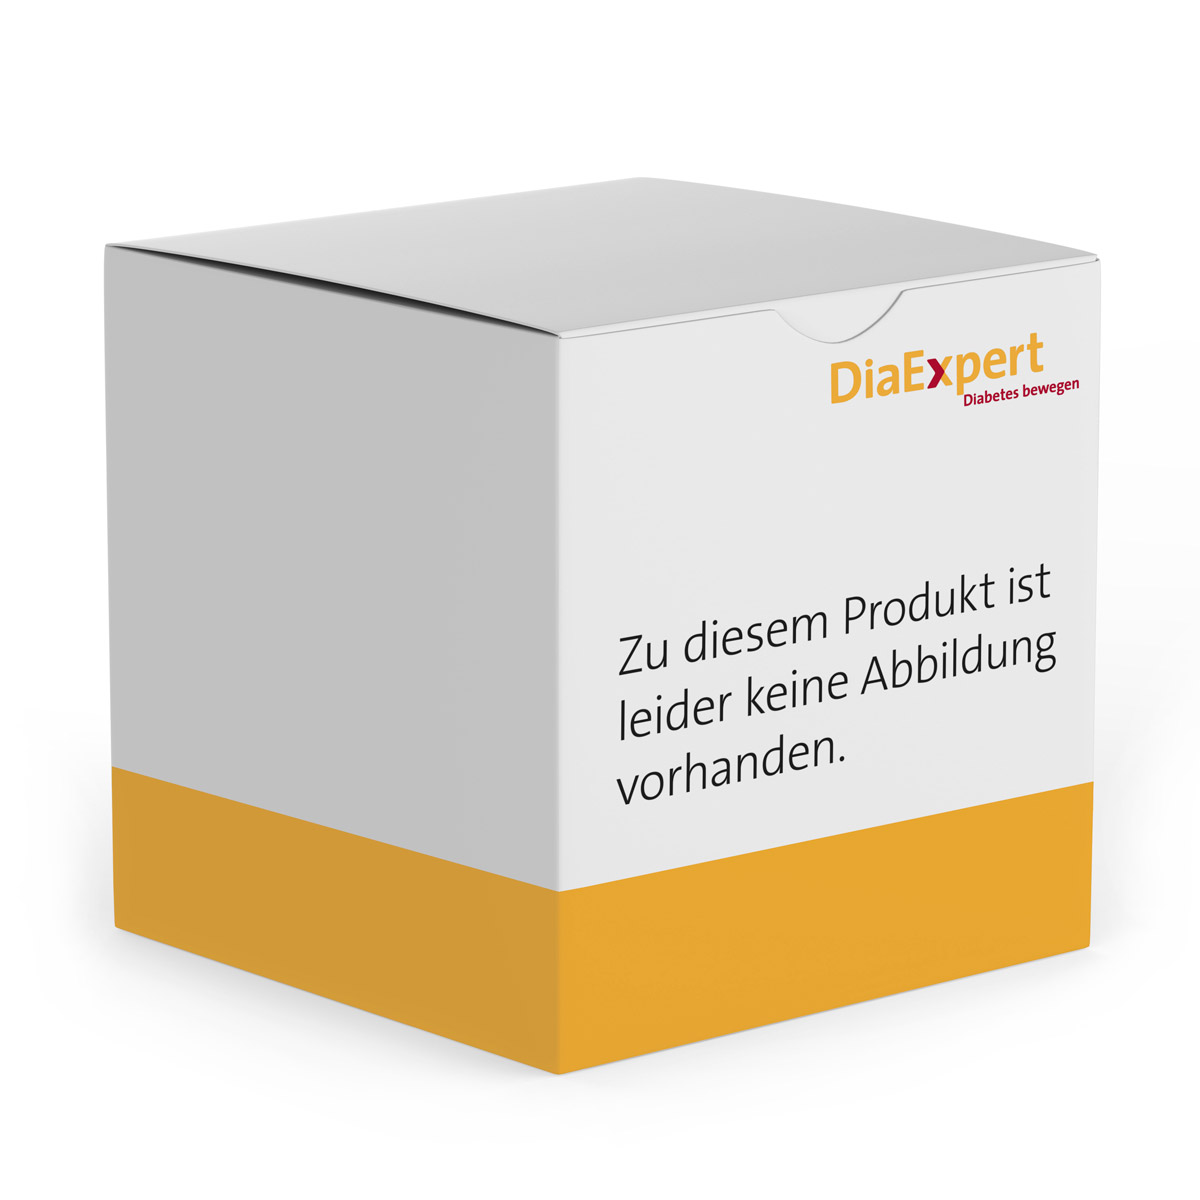 BD AutoShield Duo 0,3 x 5 mm 100 Stück